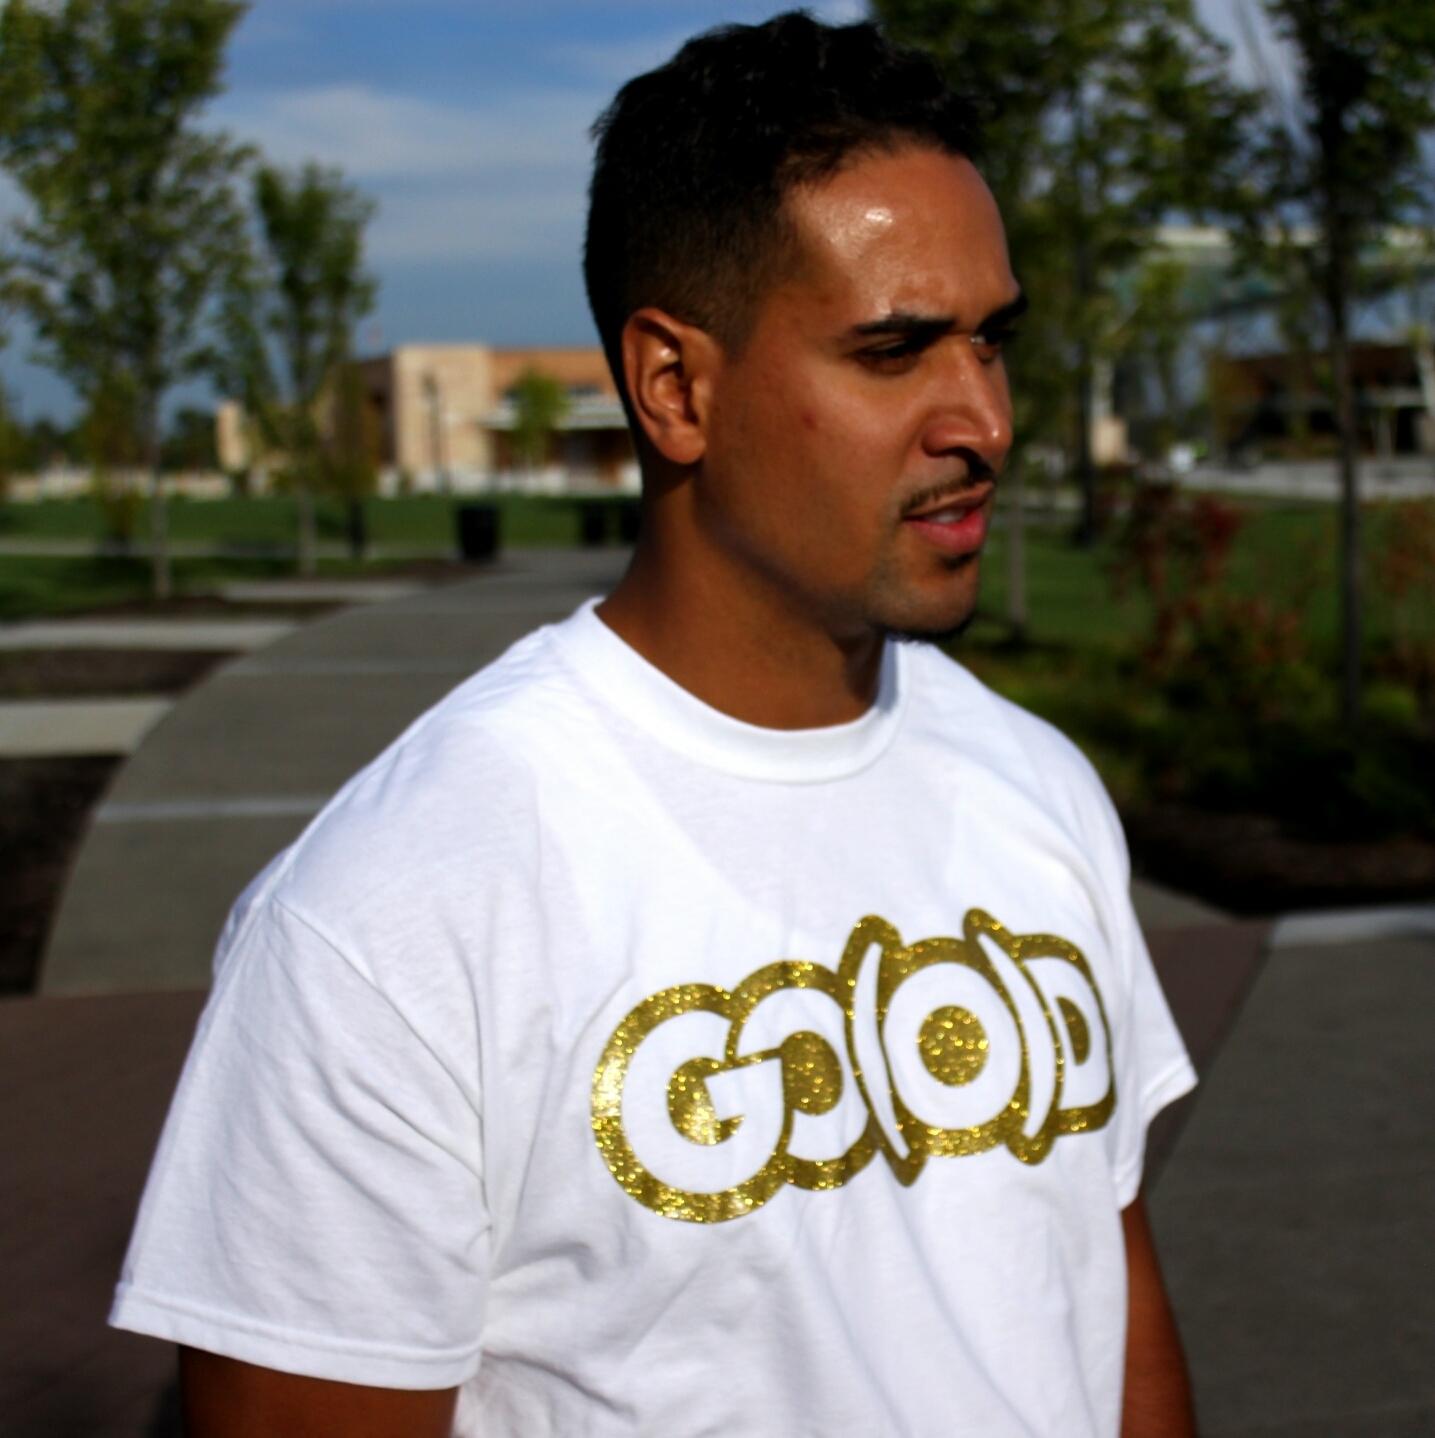 GO(O)D Gold glitter tee-white 00081